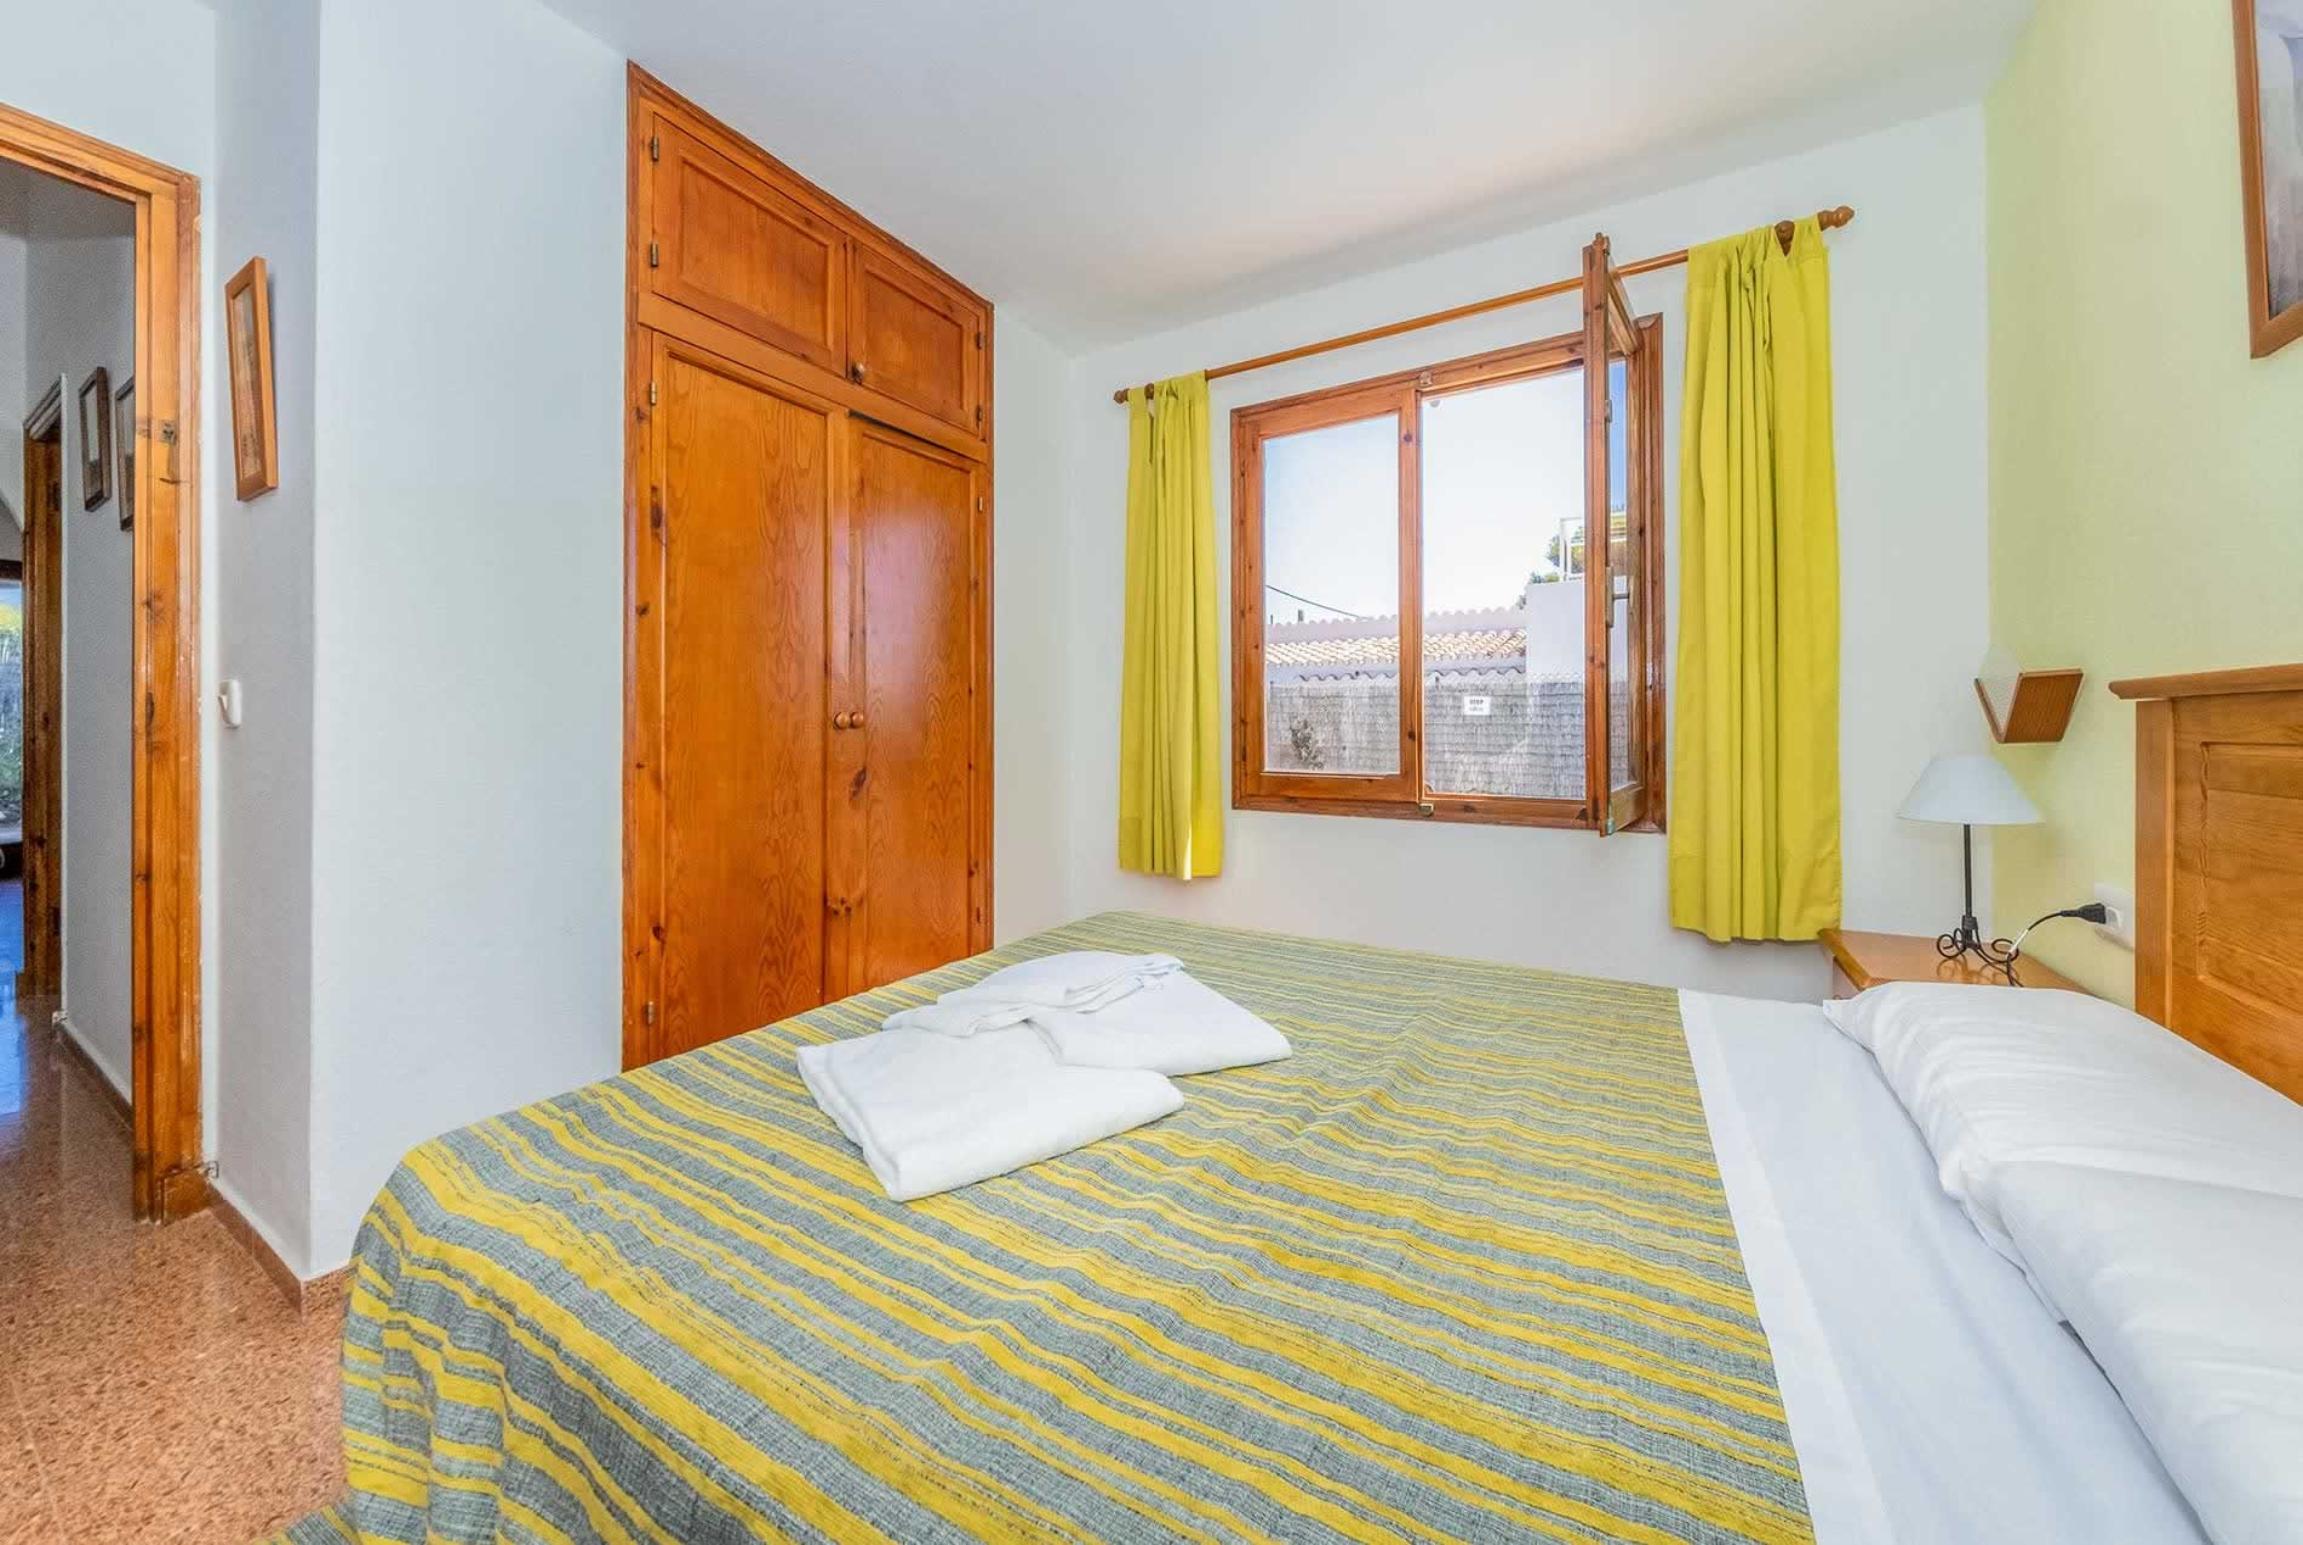 Ferienhaus Iris Prima (2653680), Punta Prima, Menorca, Balearische Inseln, Spanien, Bild 25